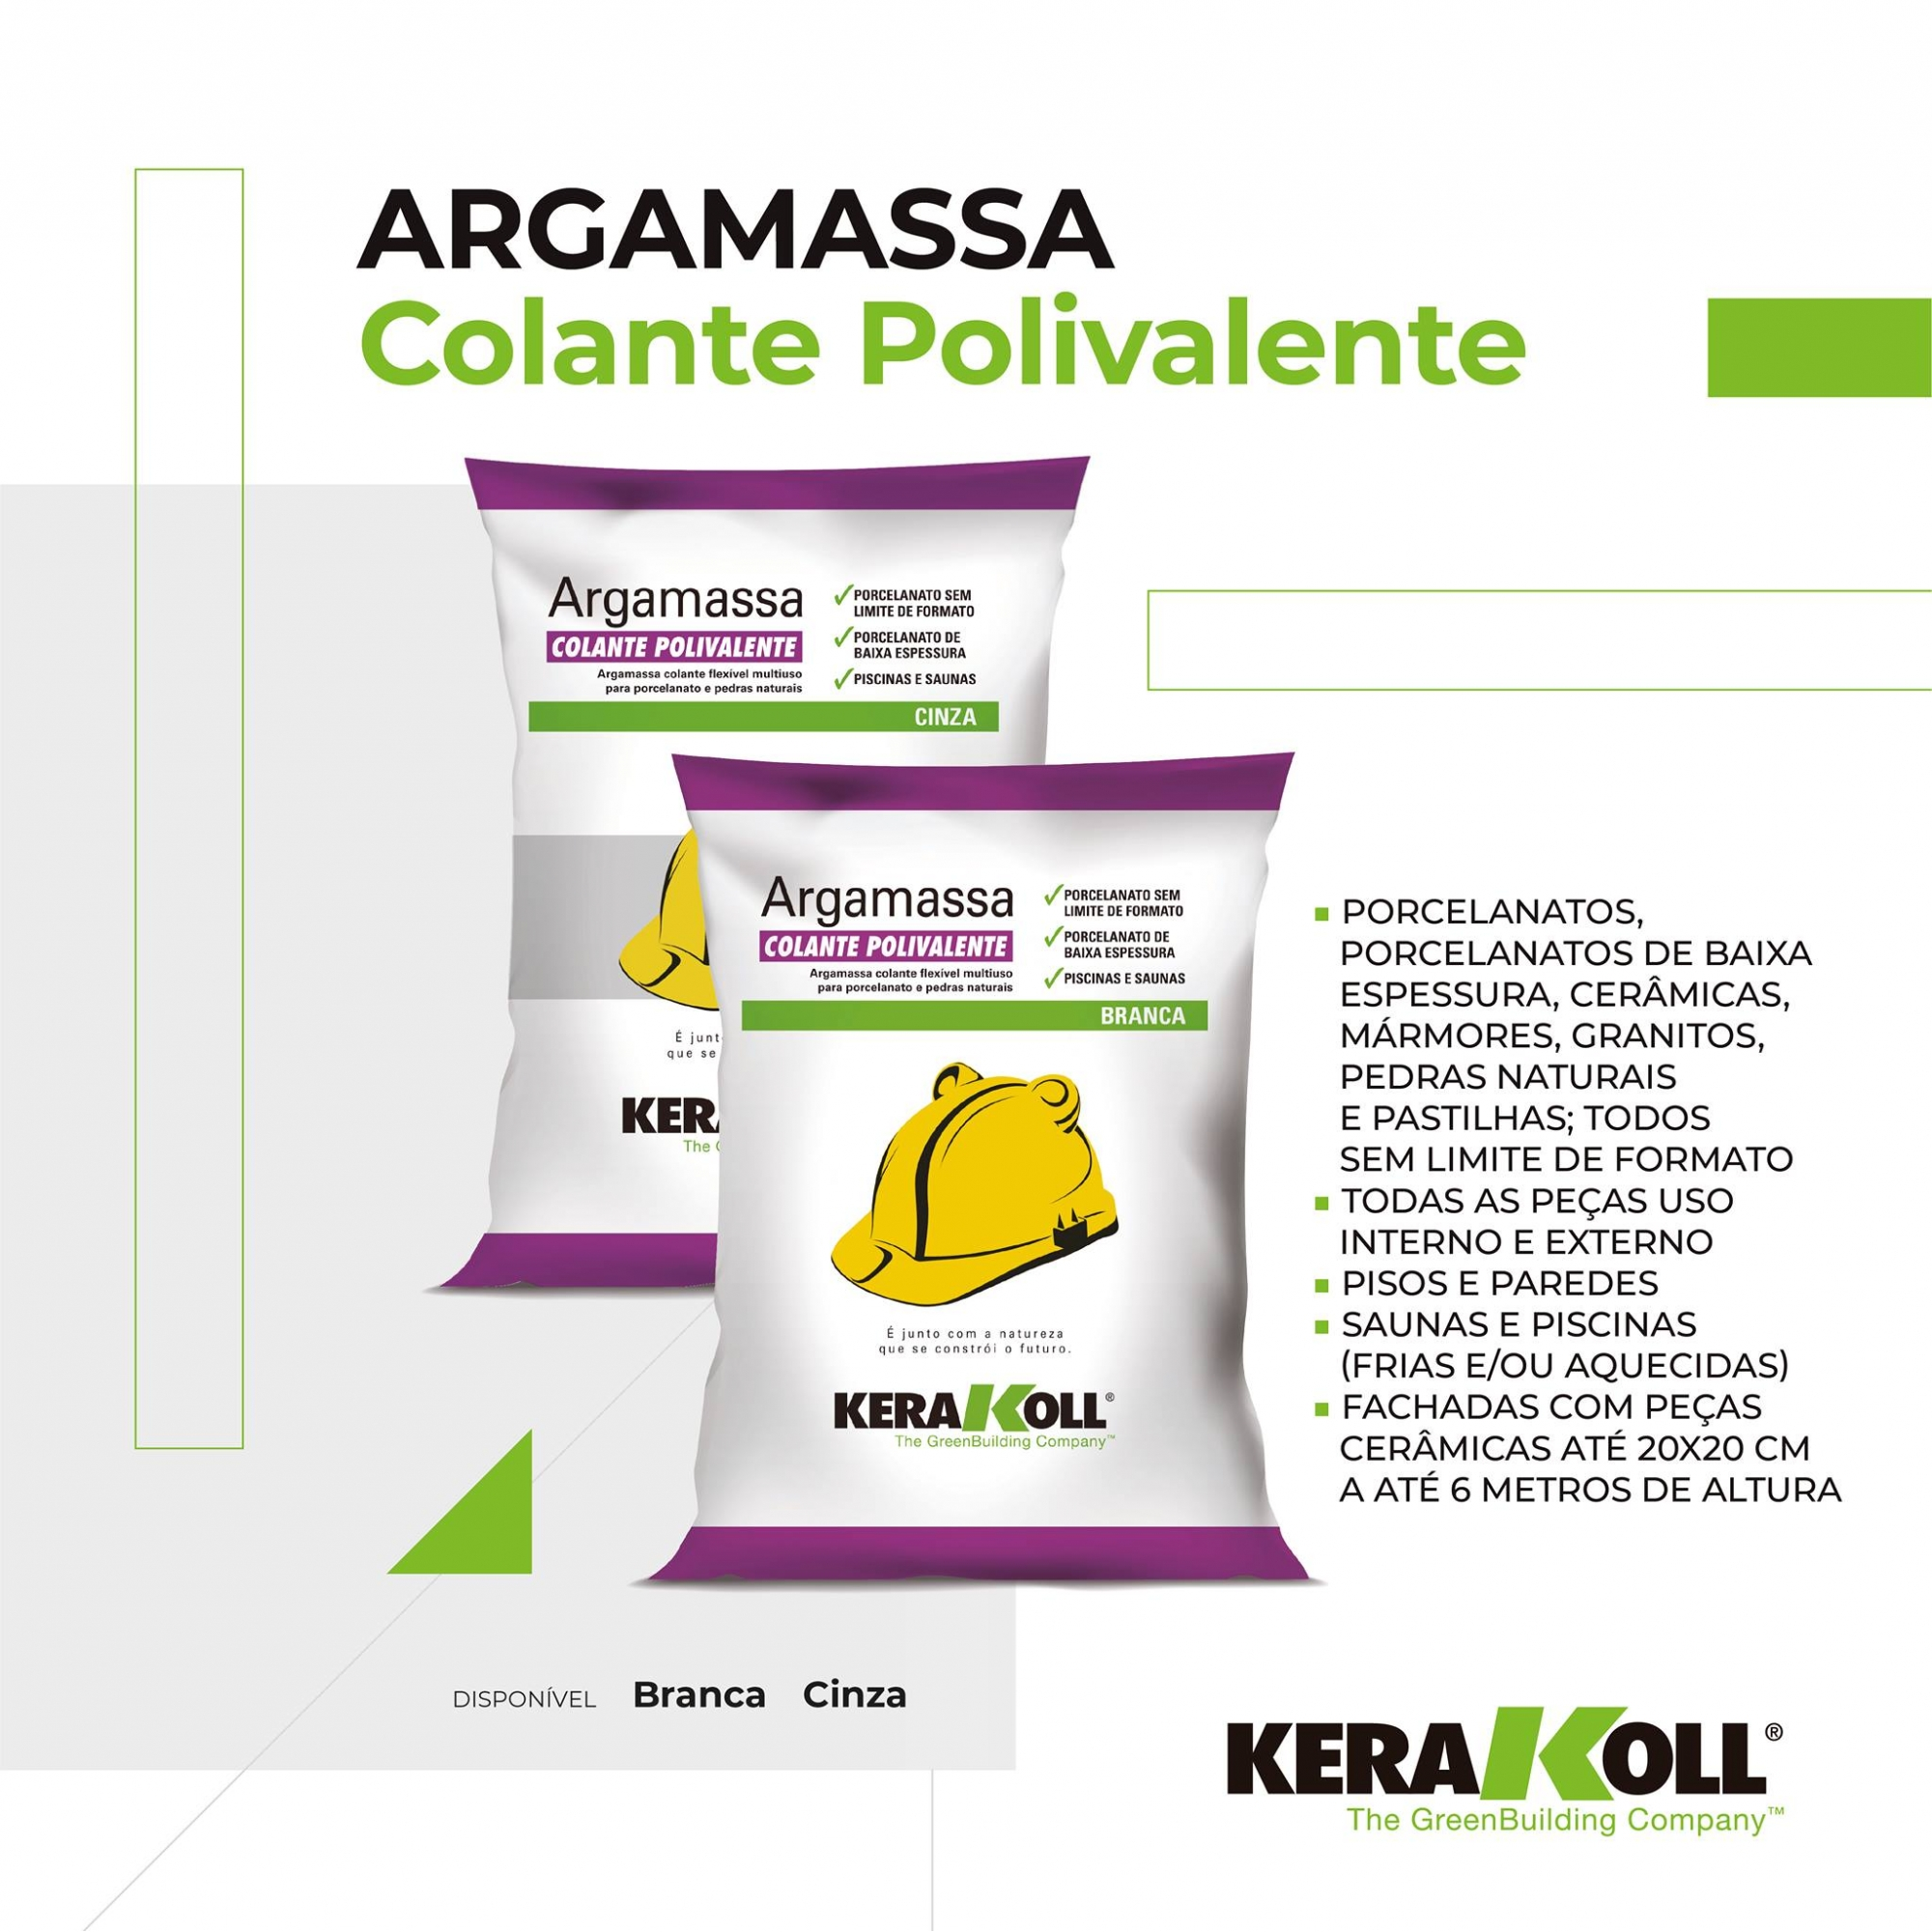 ARGAMASSA COLANTE POLIVALENTE BRANCA 20KG - KERAKOLL